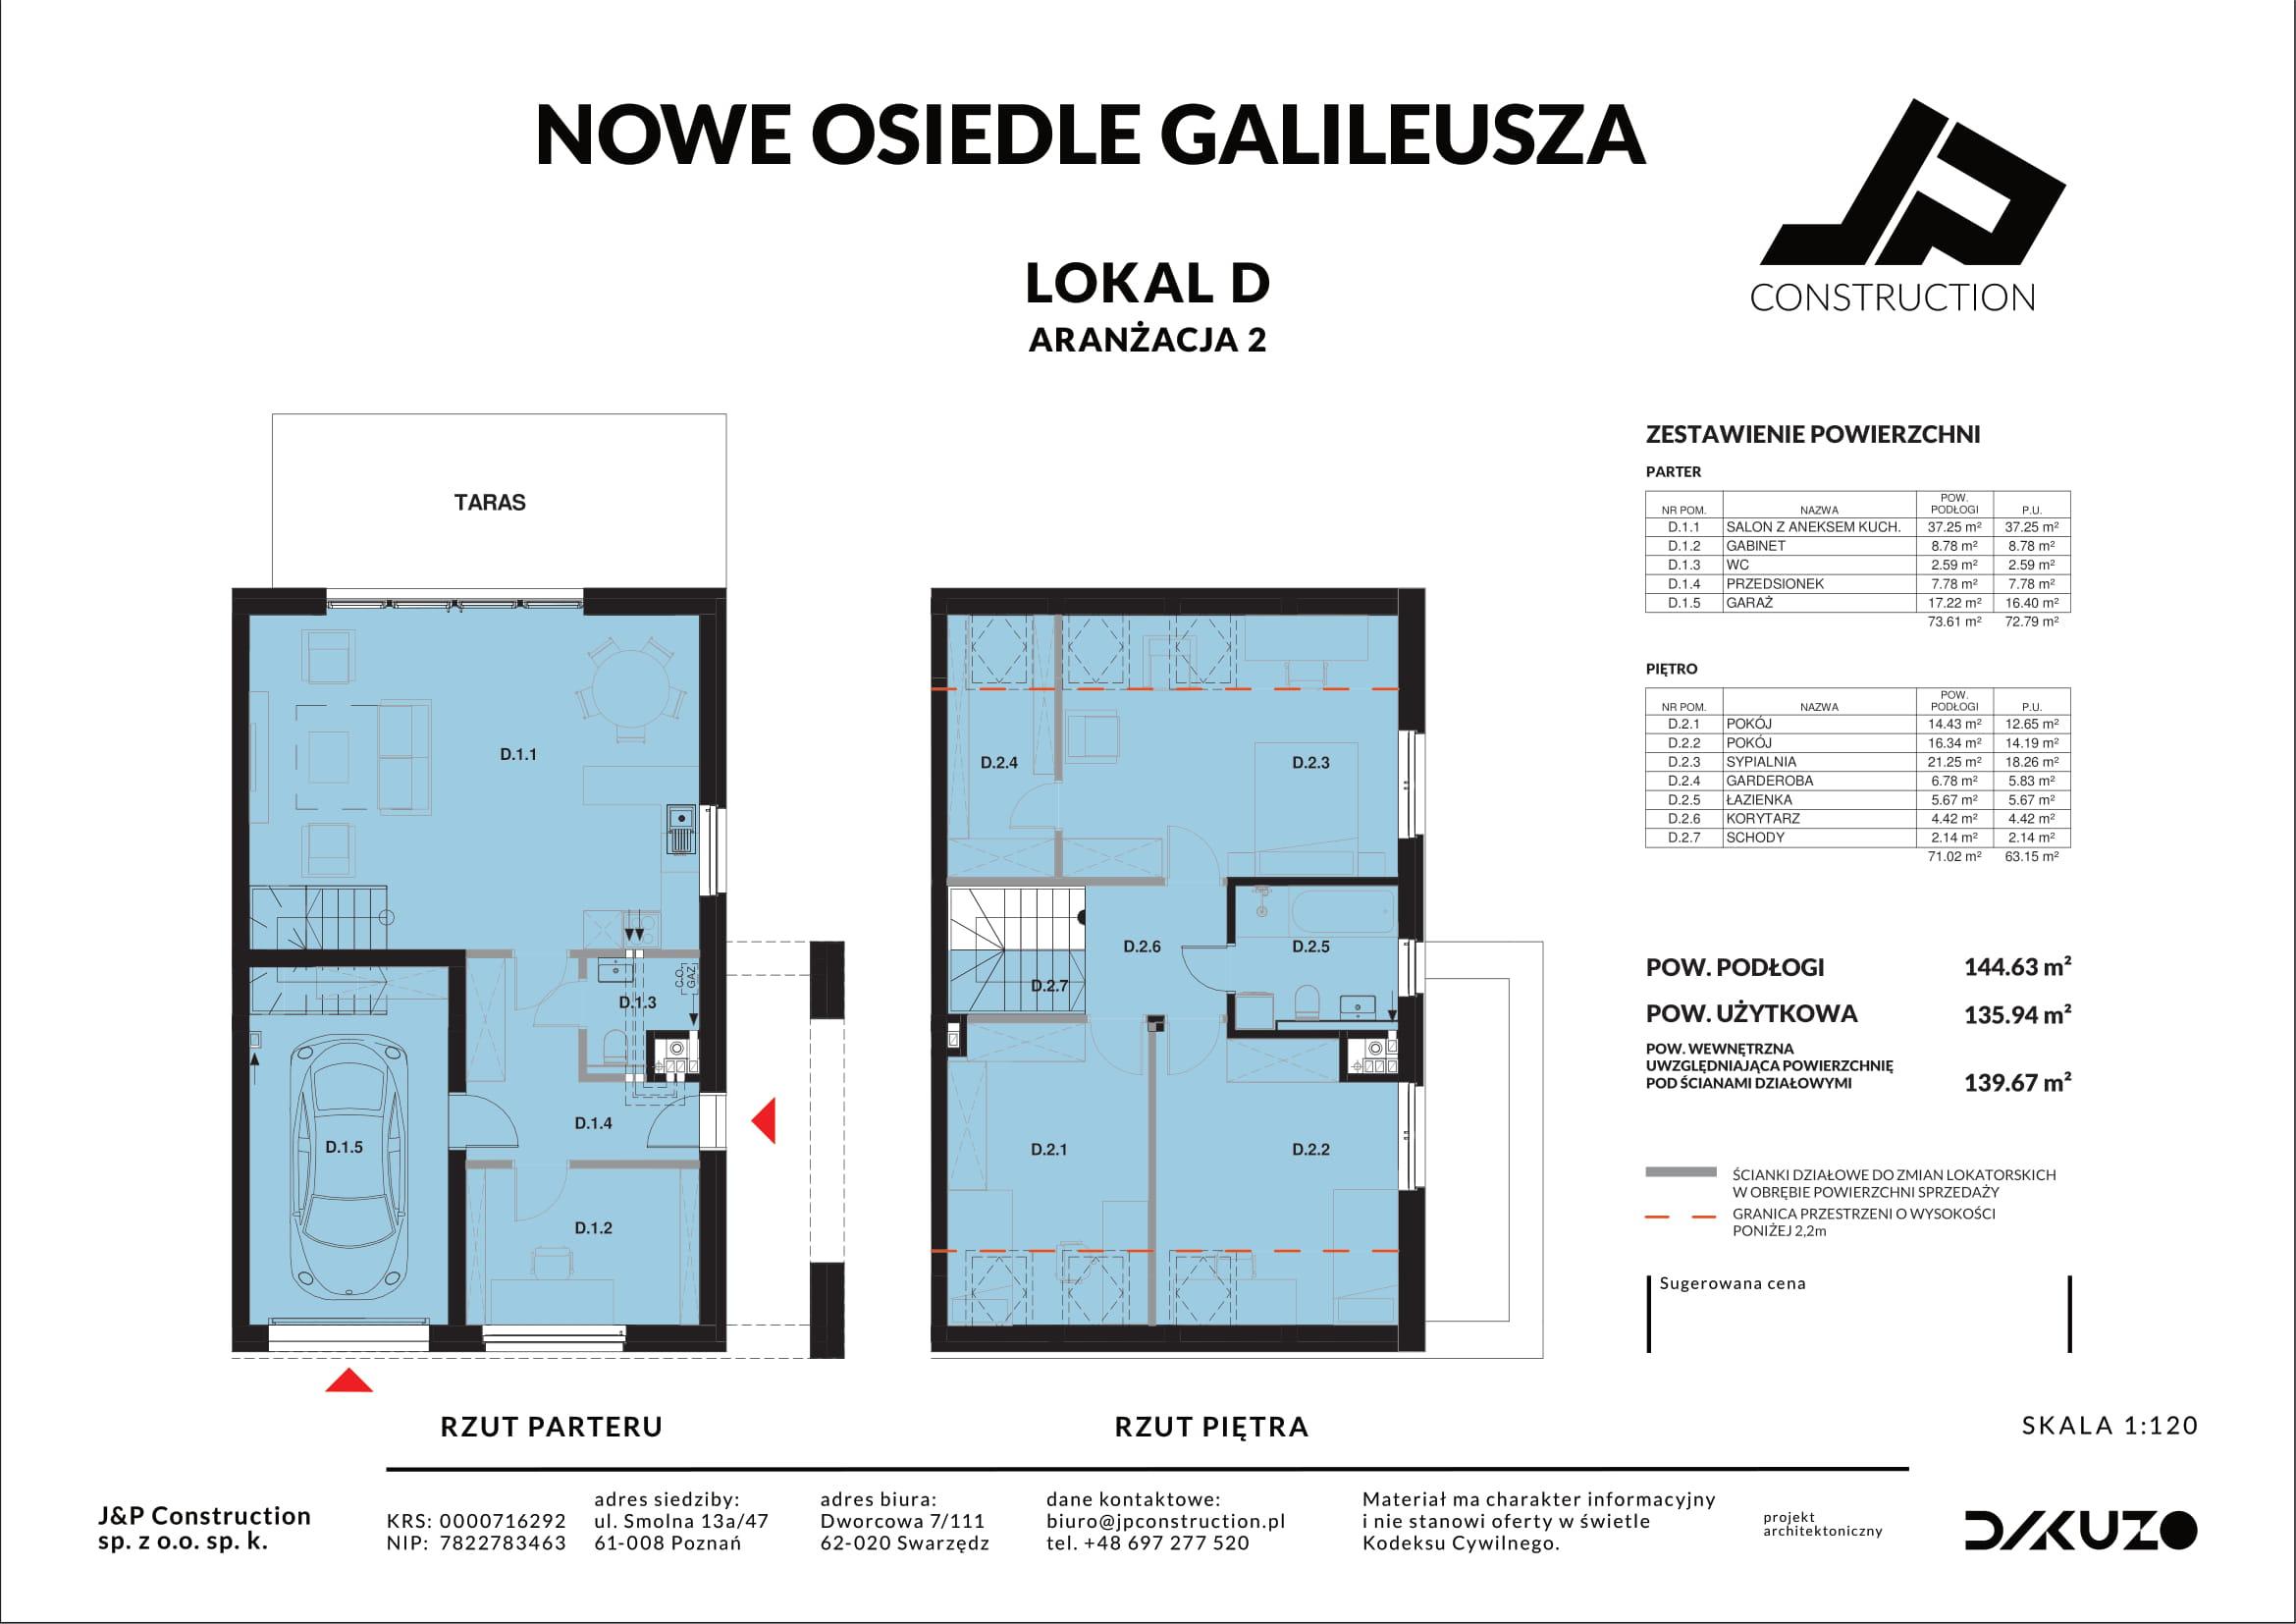 ZALASEWO-GAL-KARTA-LOKAL-D-aranzacja-2-1